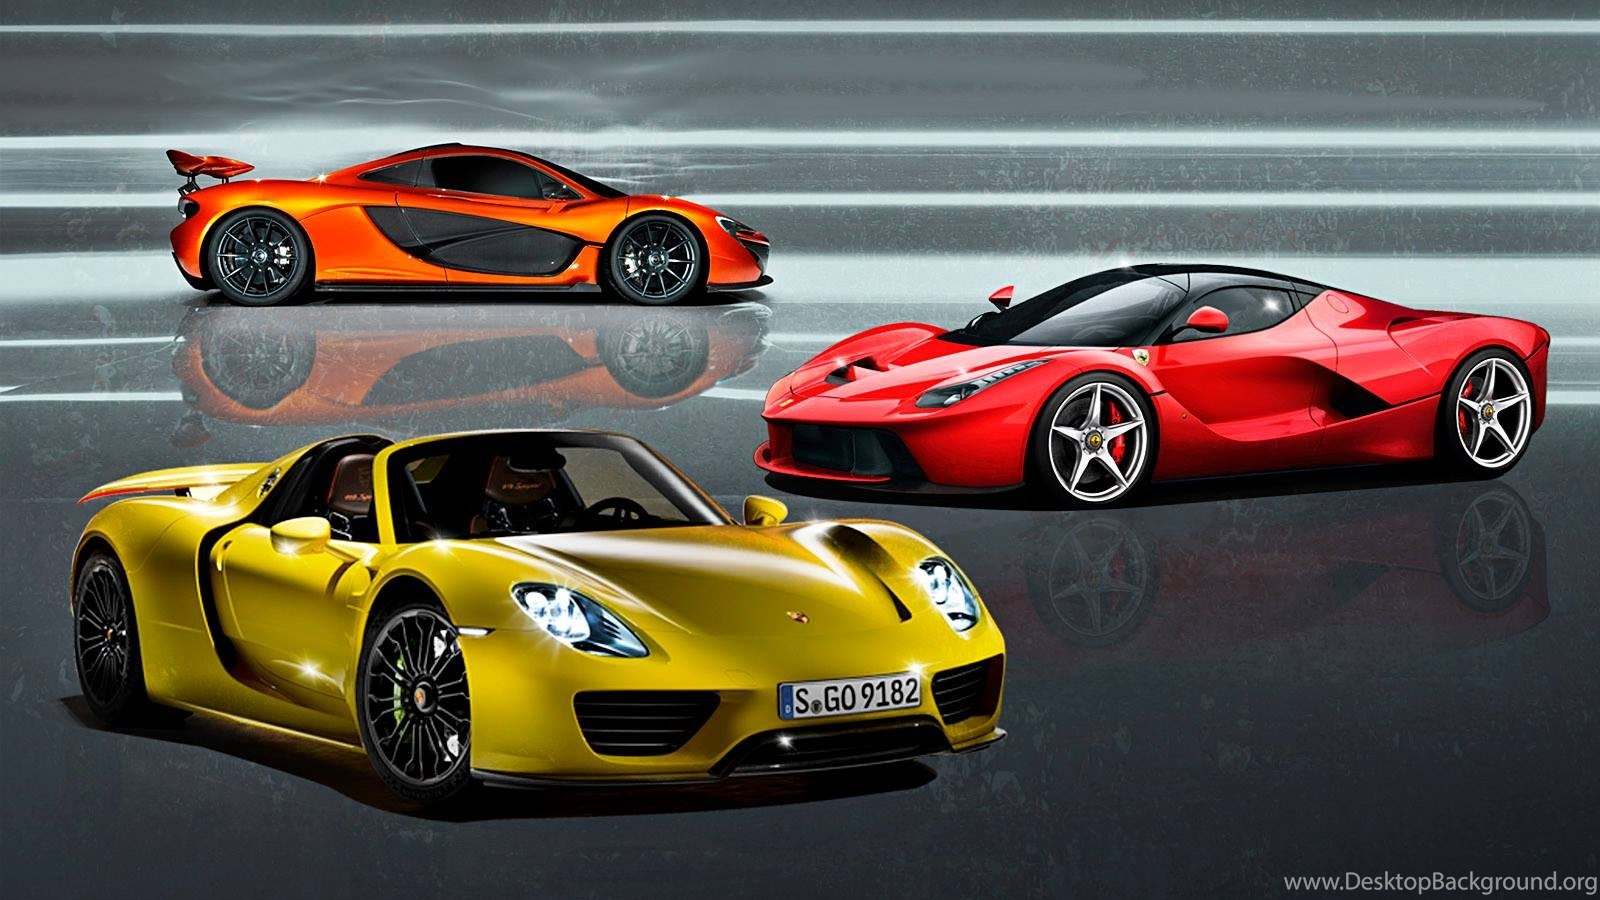 Ferrari Laferrari Vs Mclaren P1 Vs Porsche 918 Spyder Image Desktop Background